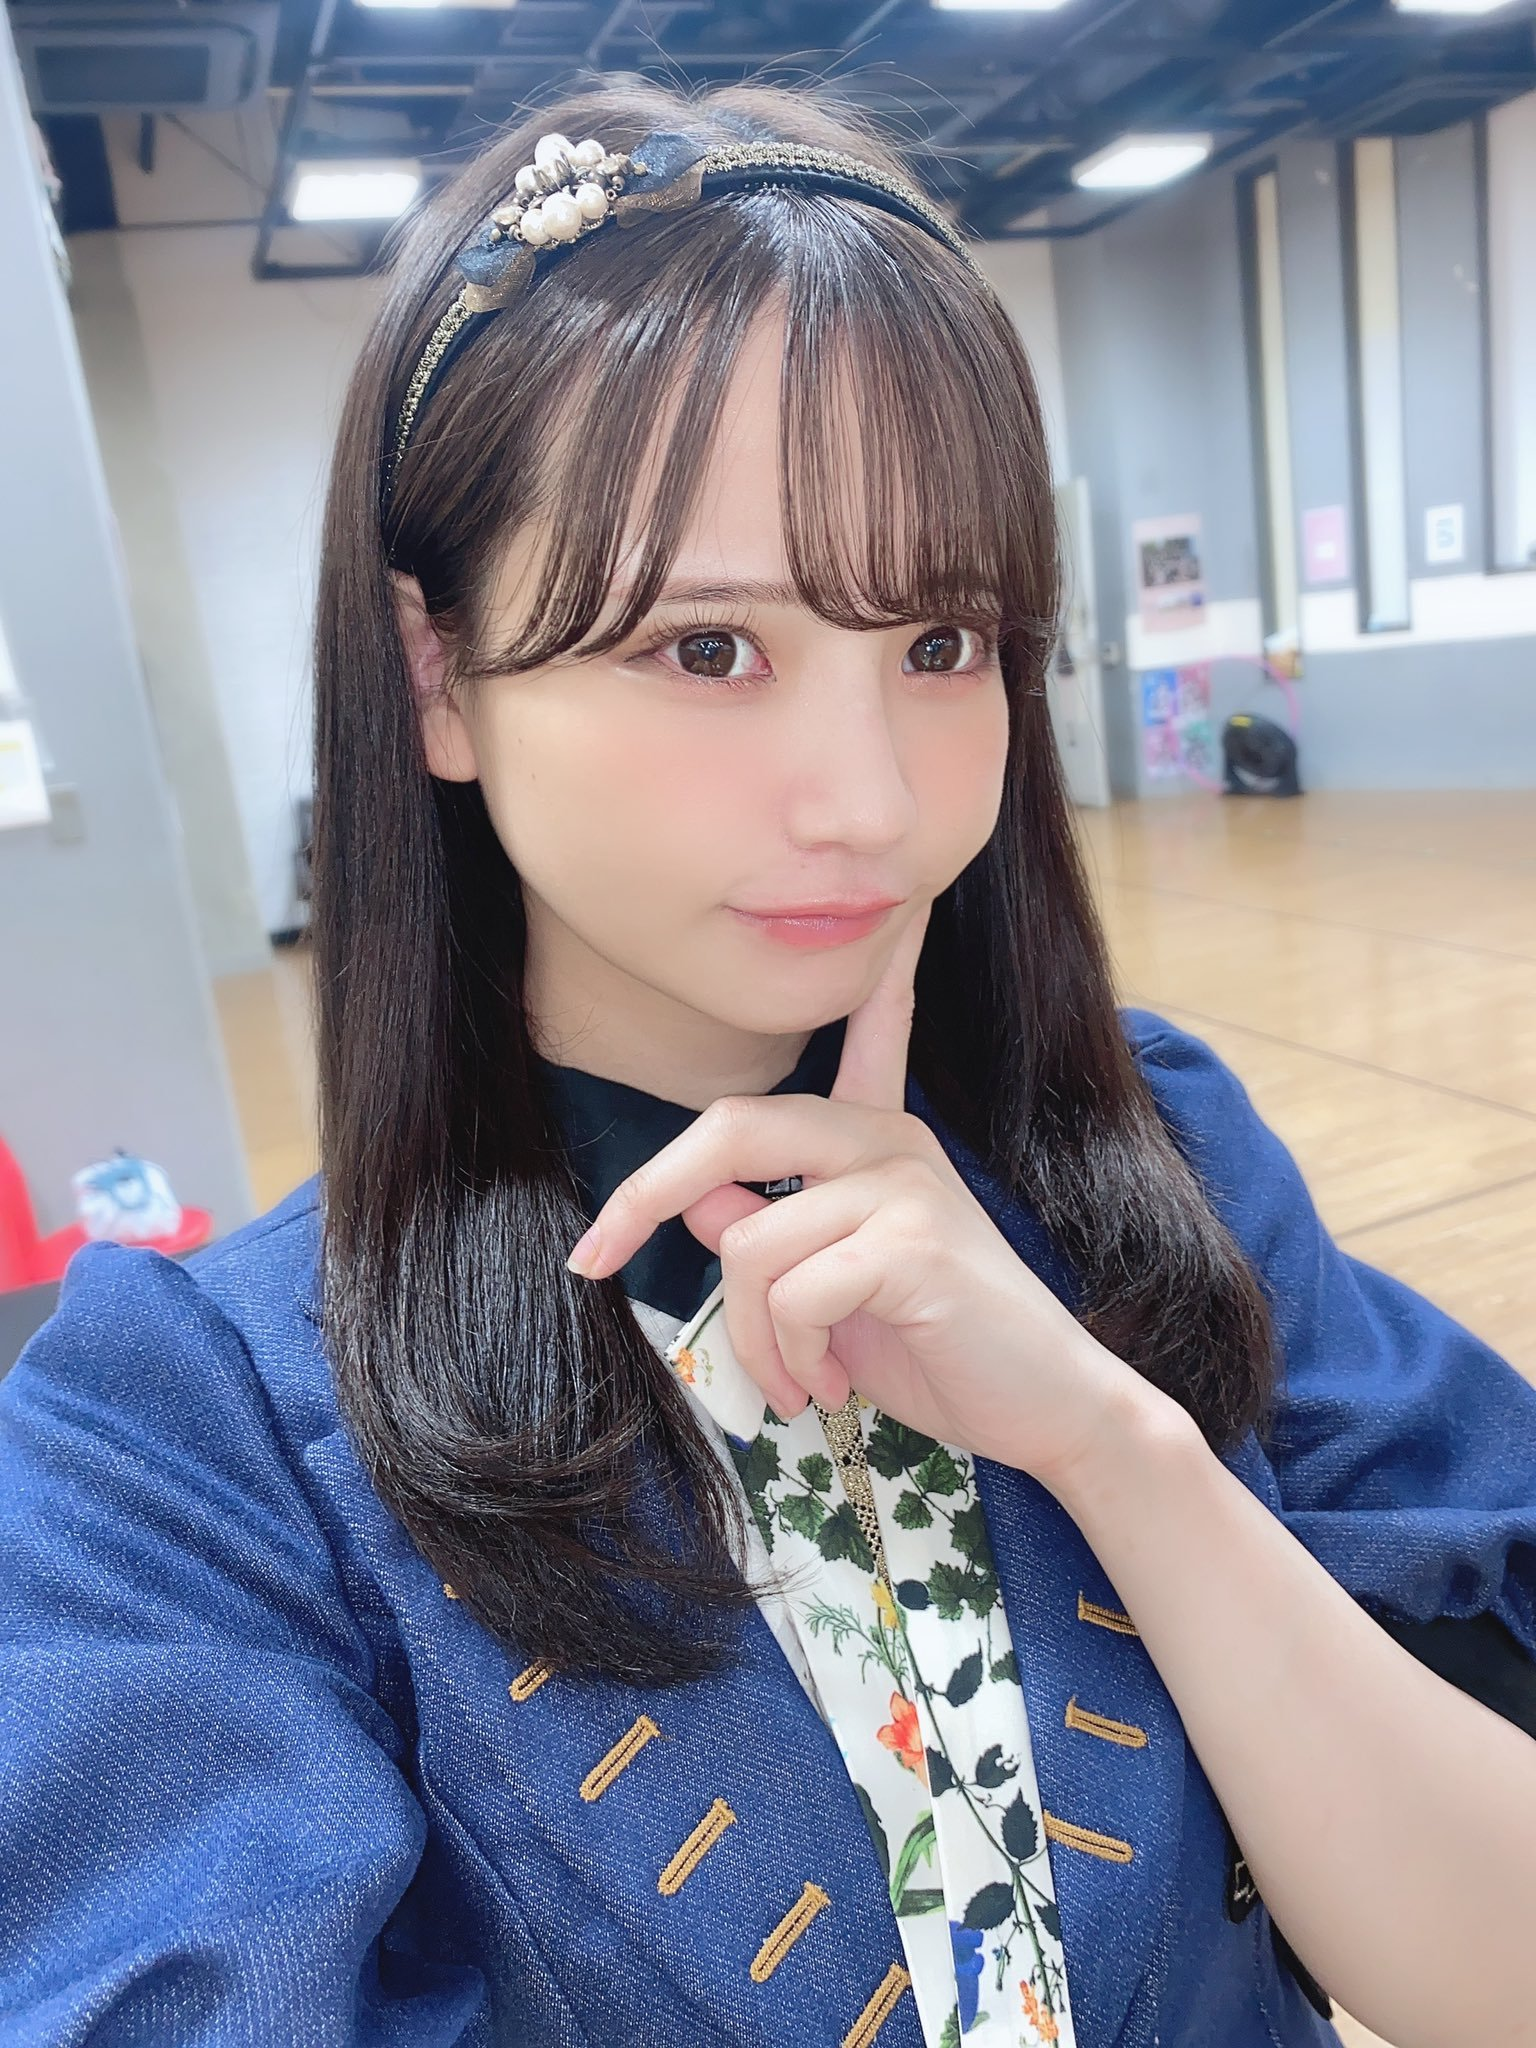 【itotii正妹】NMB48《和田海祐》甜美可爱,充满着性感魅力!-itotii